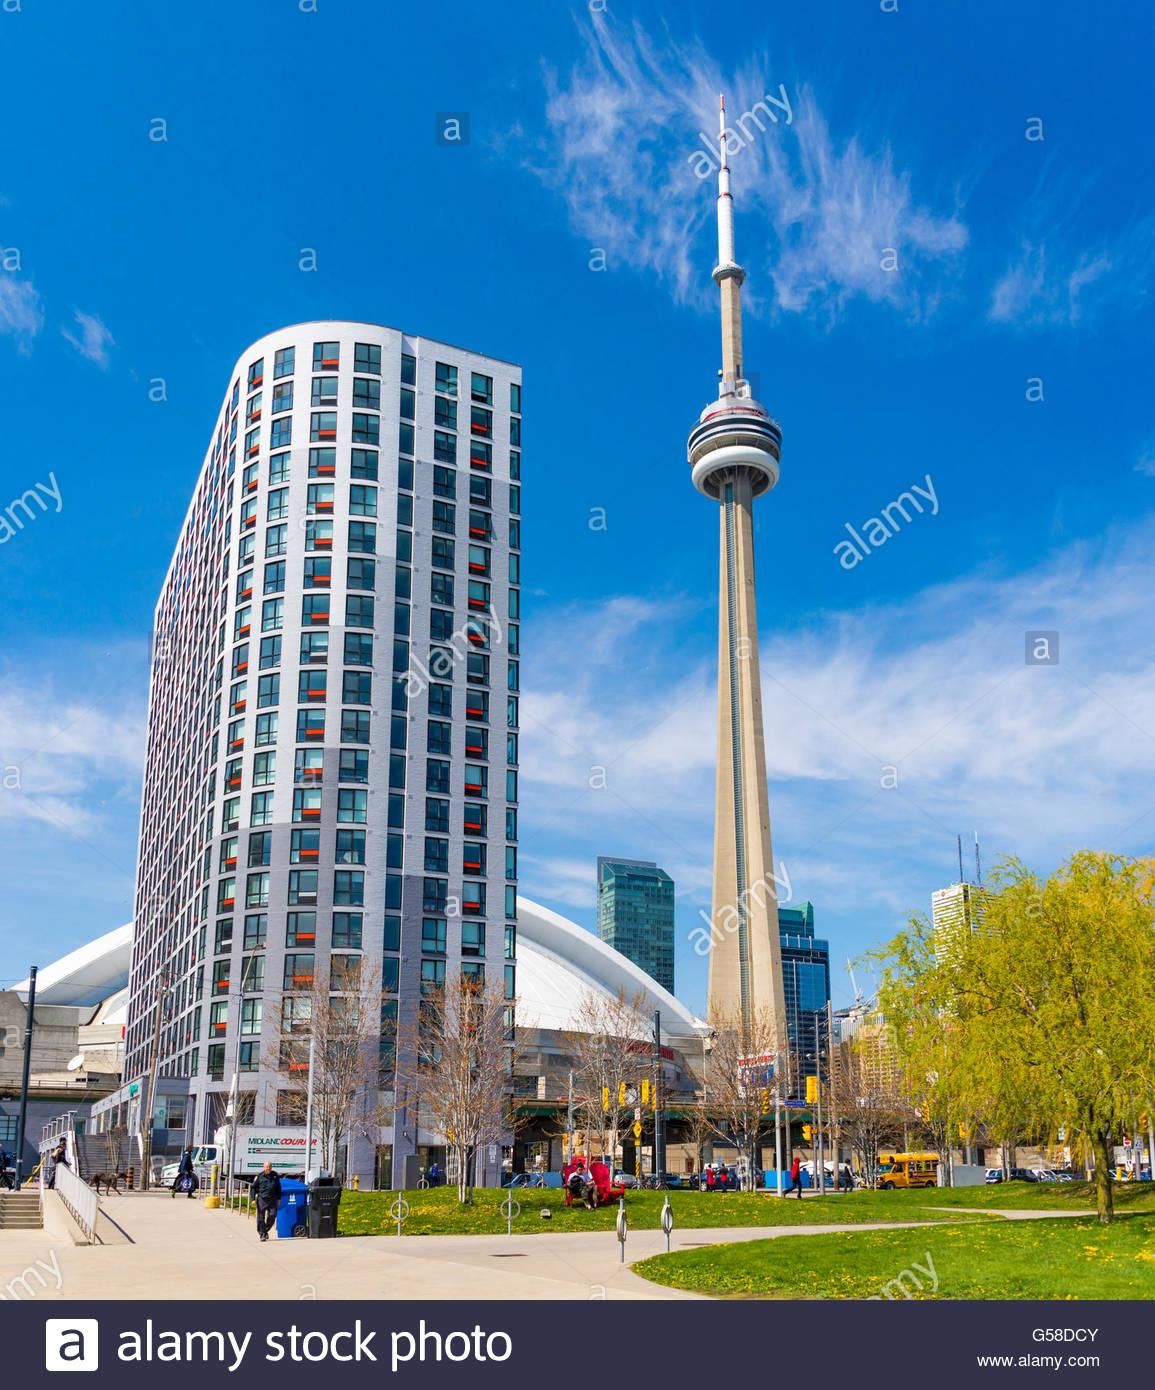 Toronto Downtown skyline del parque, Tall majestuosa Torre CN. La torre es un símbolo de la historia de Canadá Imagen De Stock